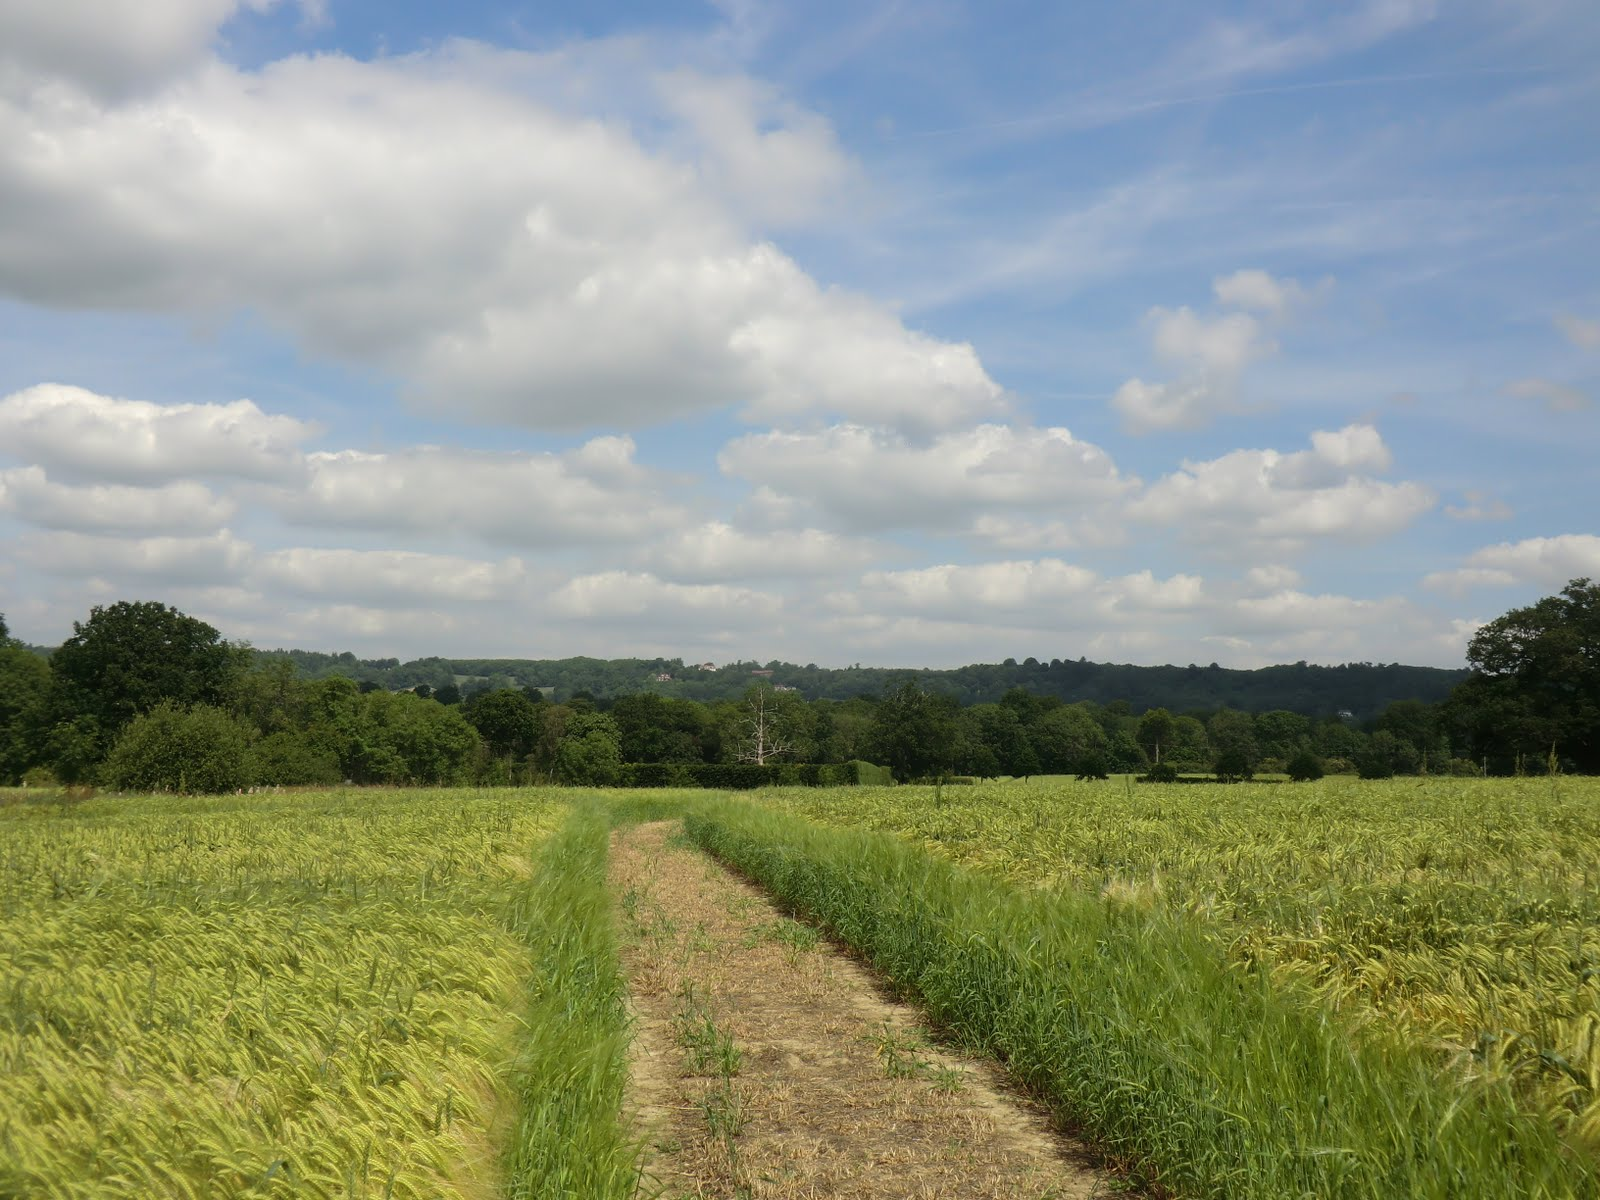 CIMG1995 Towards Great Hollanden Farm